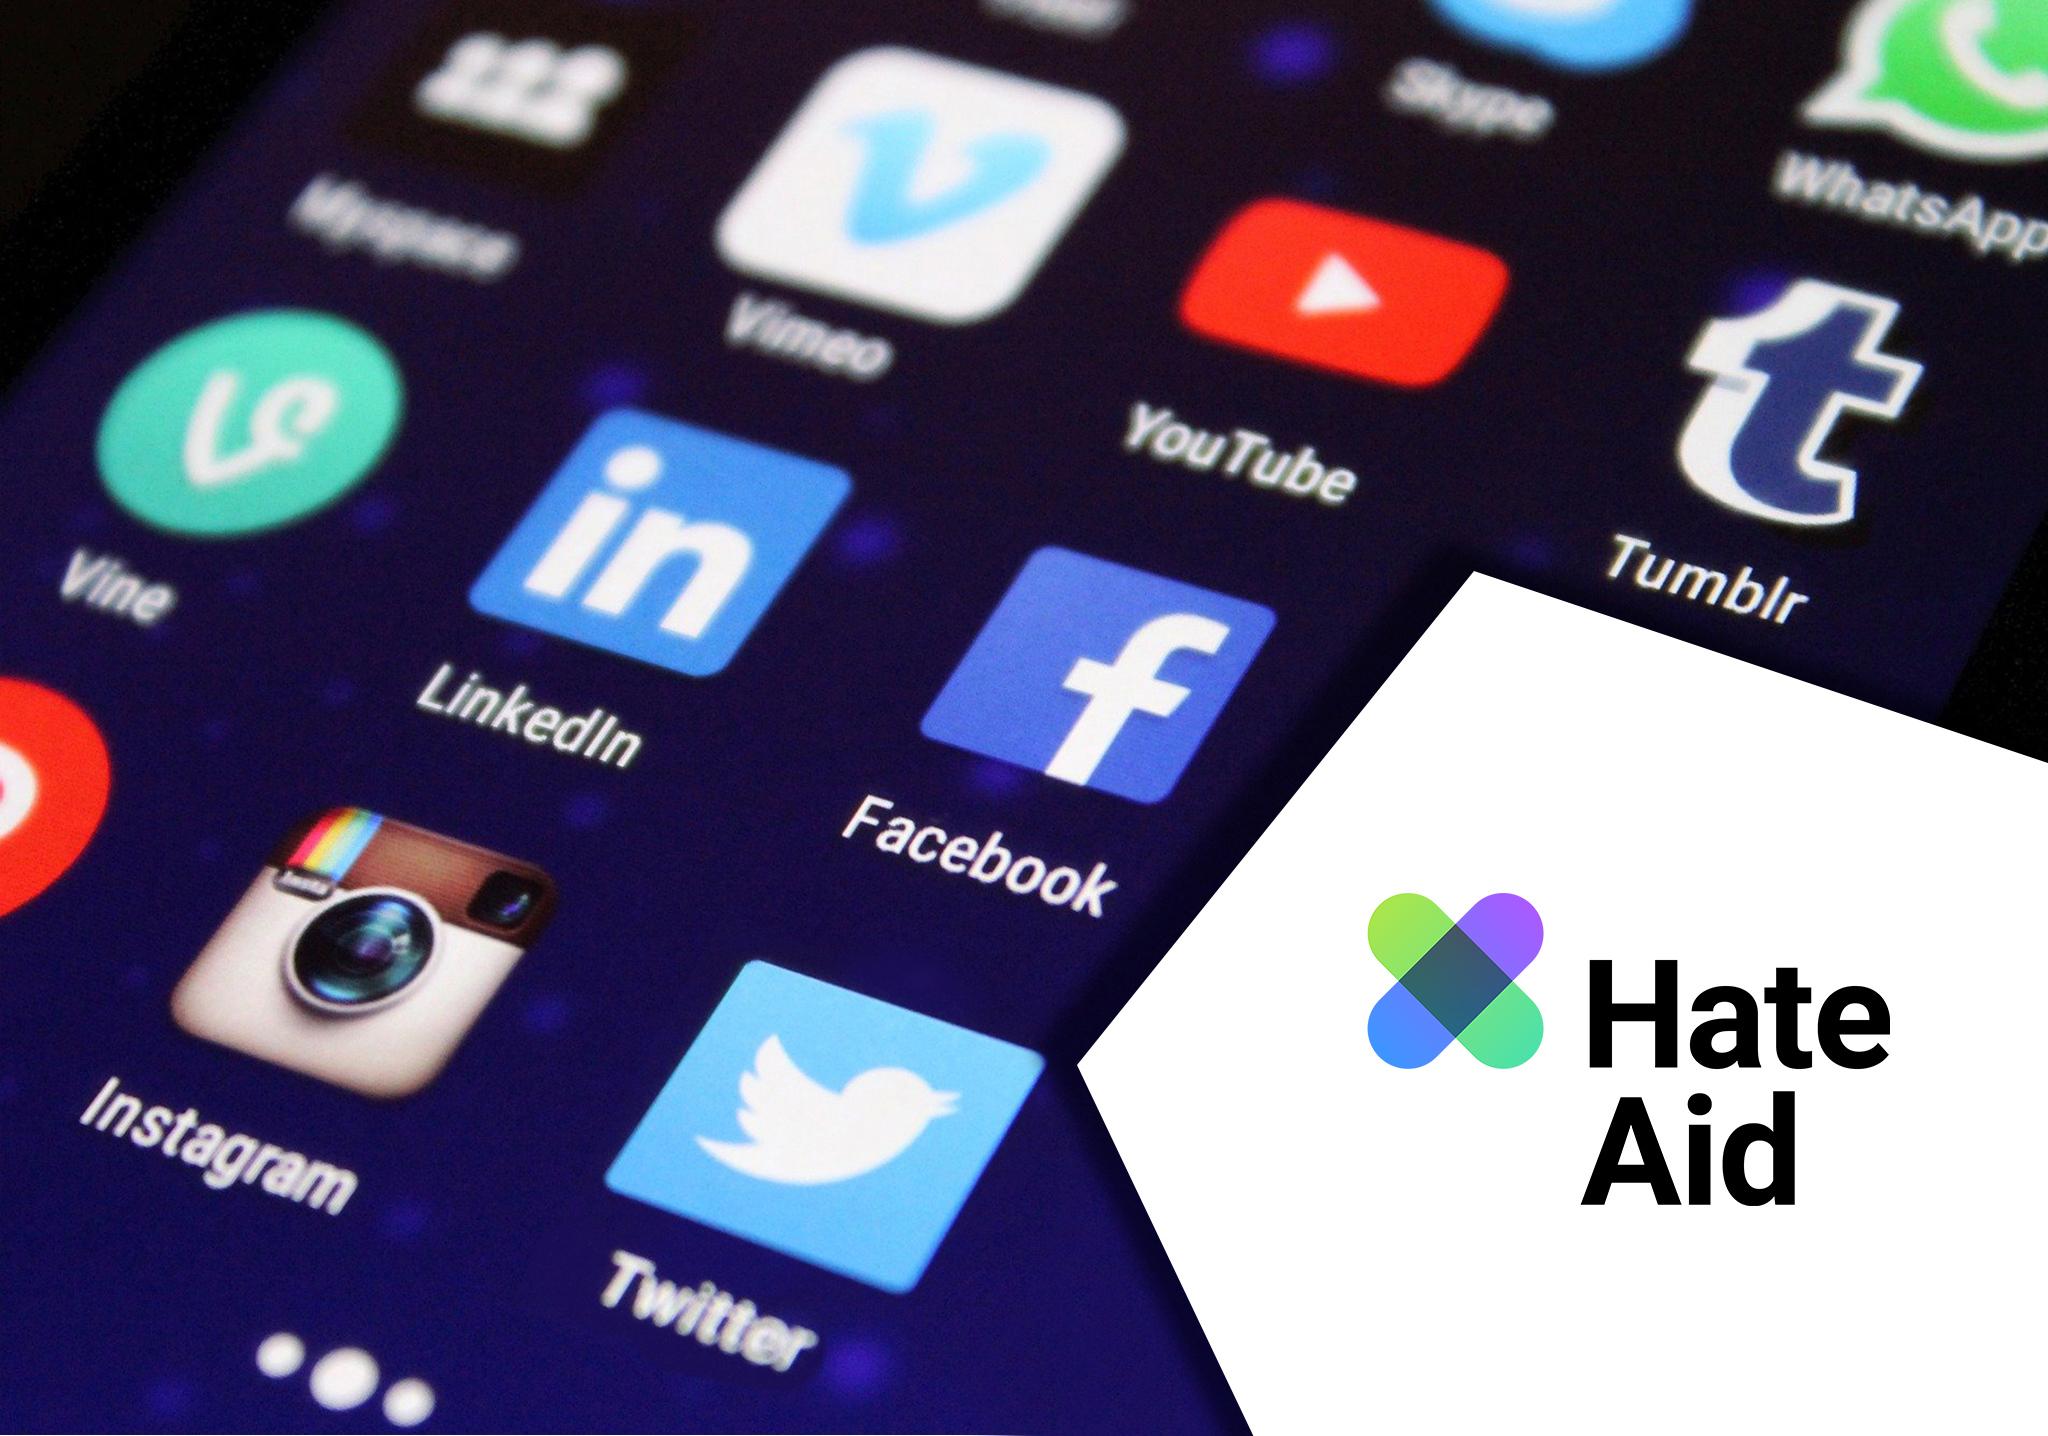 HateAid, die Anlaufstelle gegen digitale Gewalt